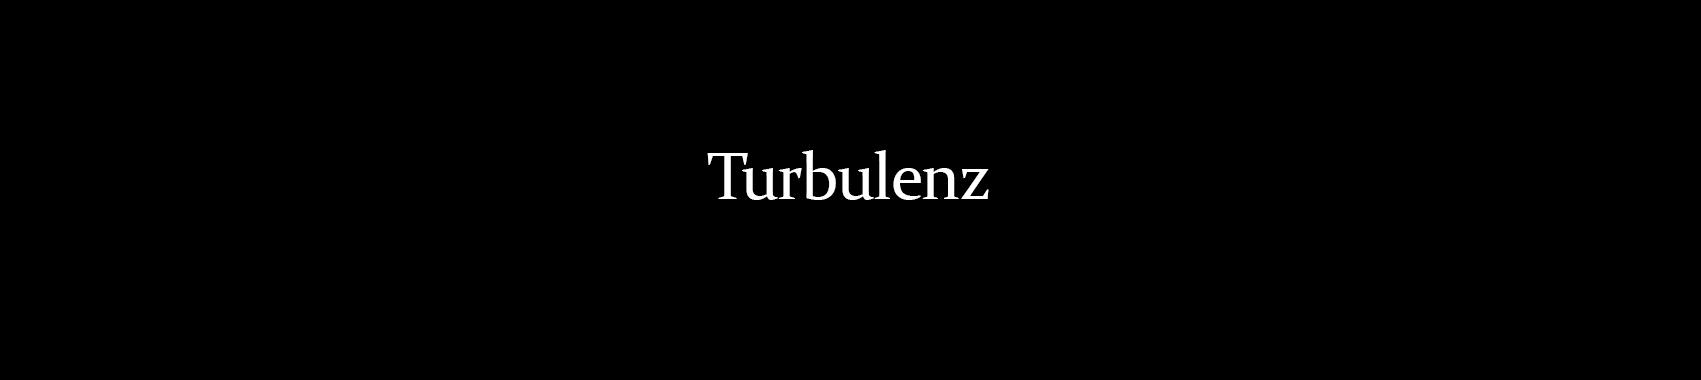 turbu_banner